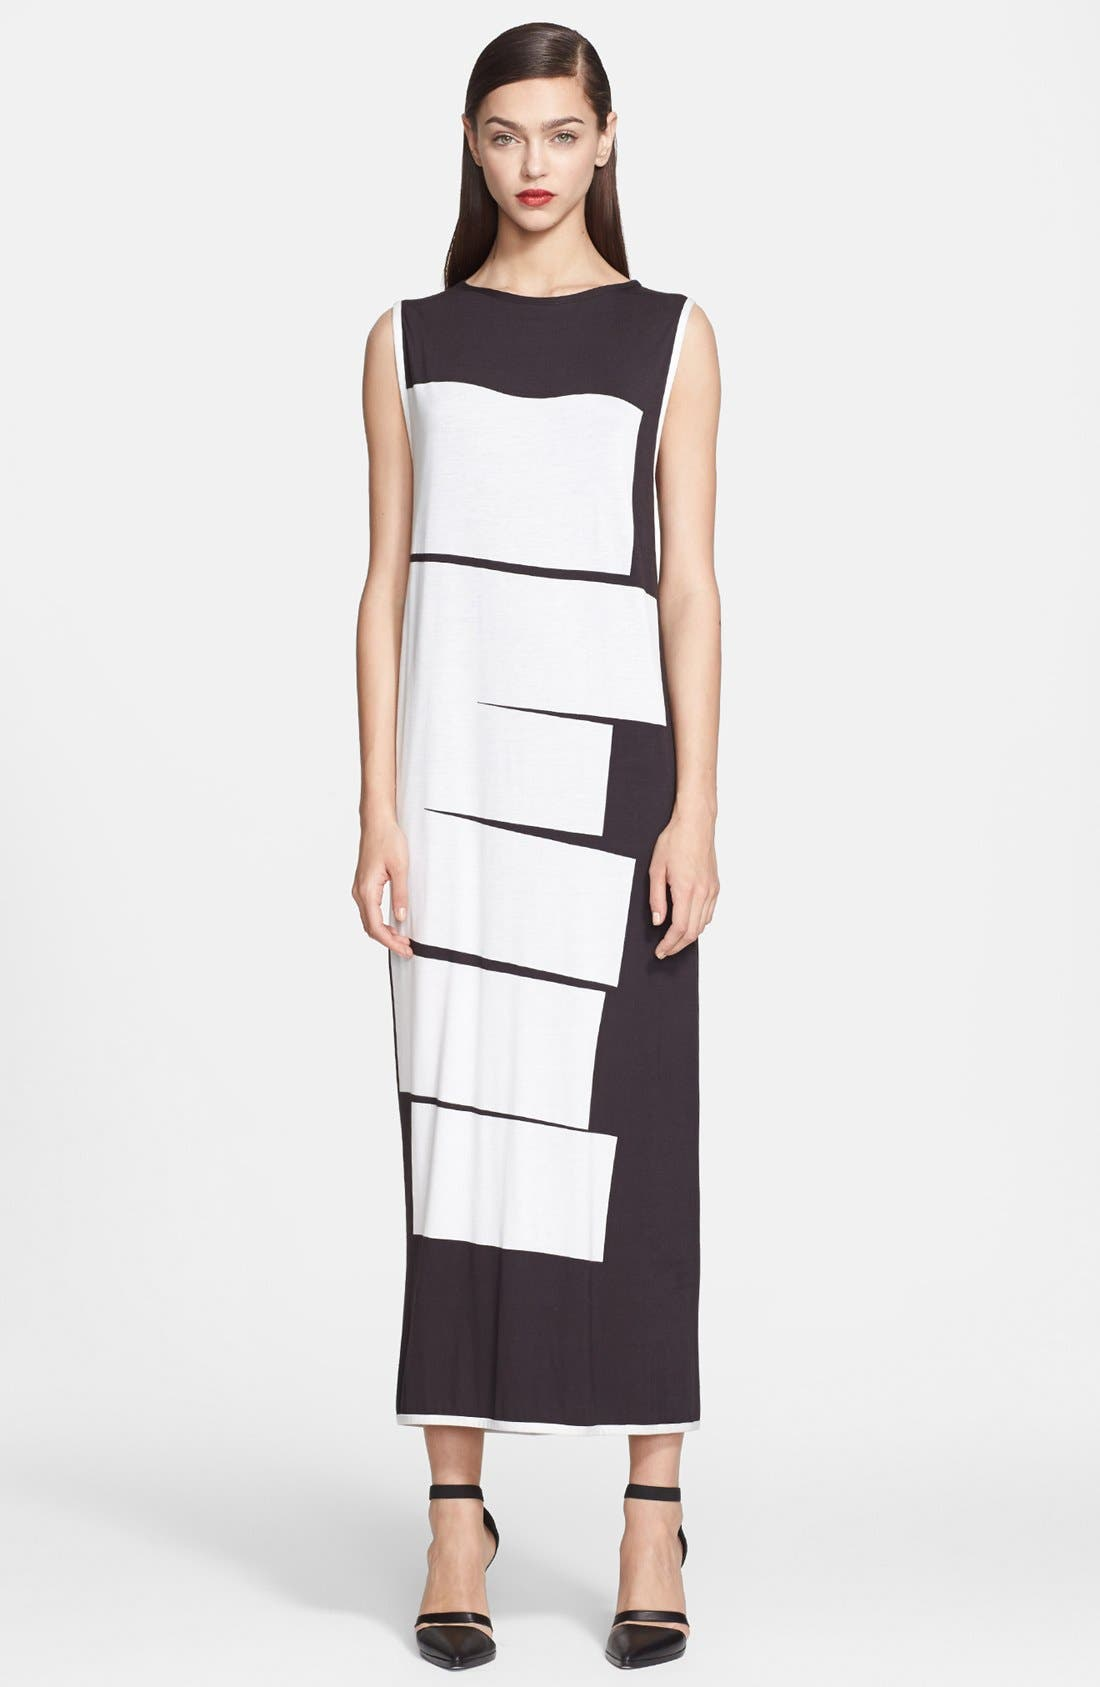 Alternate Image 1 Selected - Helmut Lang Lithograph Print Jersey Maxi Dress